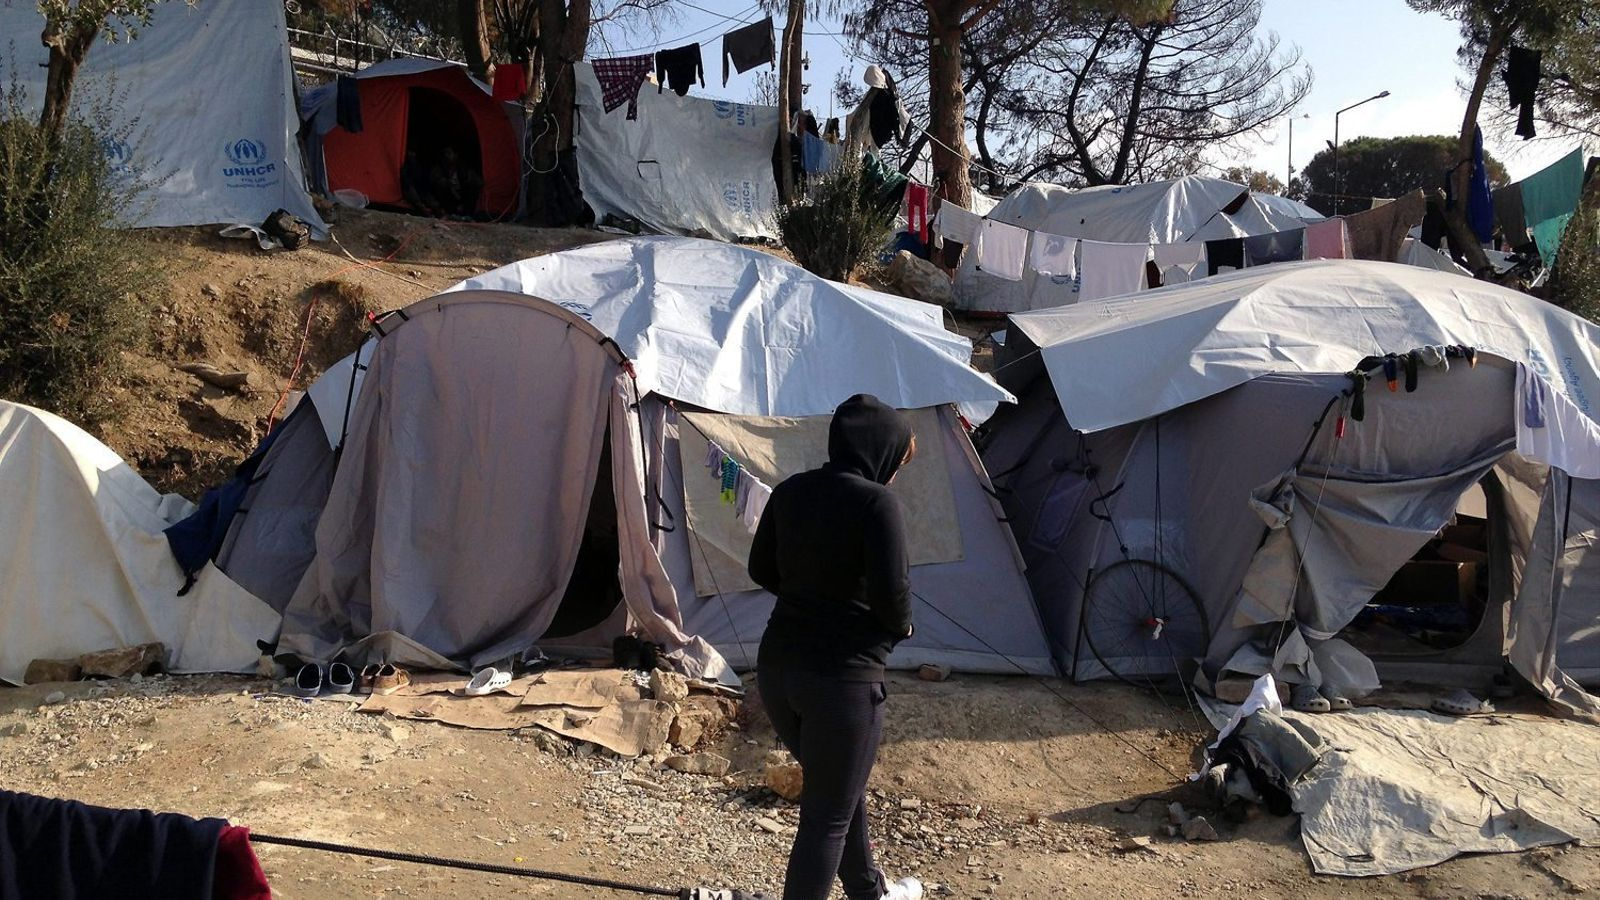 La política de refugiats  s'ha de basar en fets, no en la por